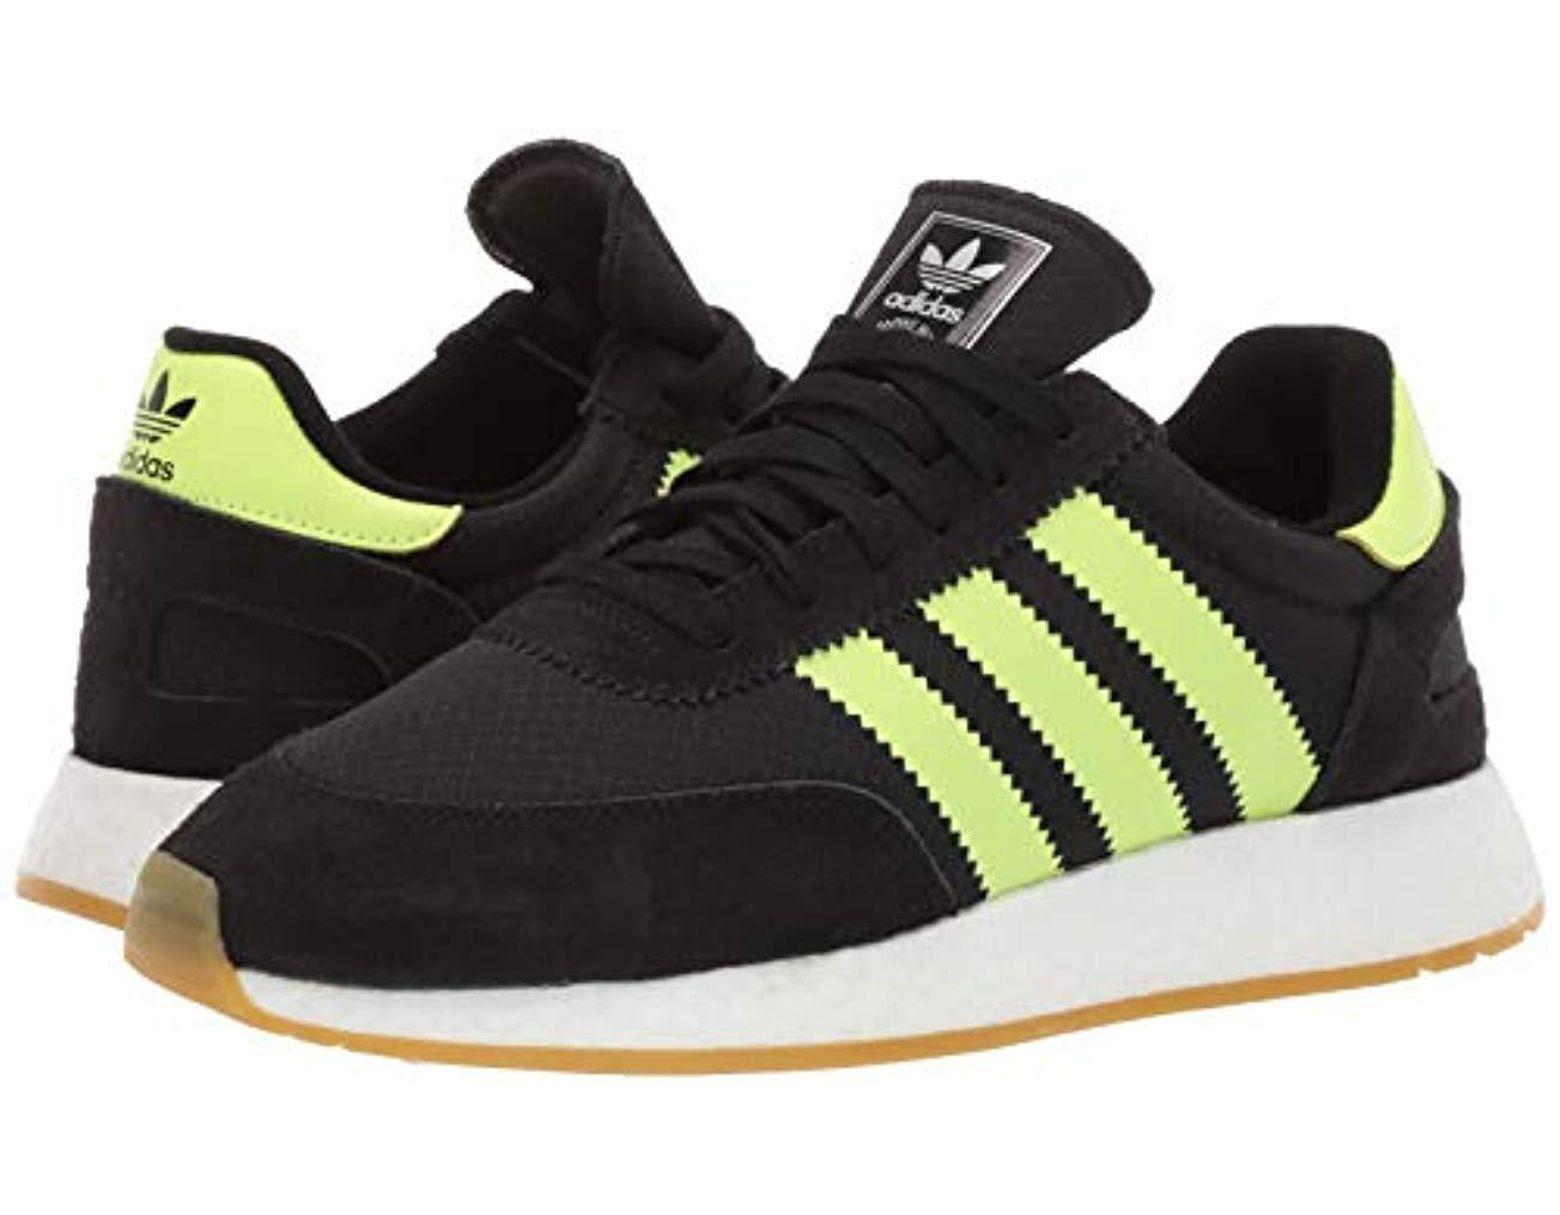 San Francisco diseño innovador nuevo diseño Men's I-5923 Running Shoe, Black/hi-res Yellow/gum, 6.5 M Us